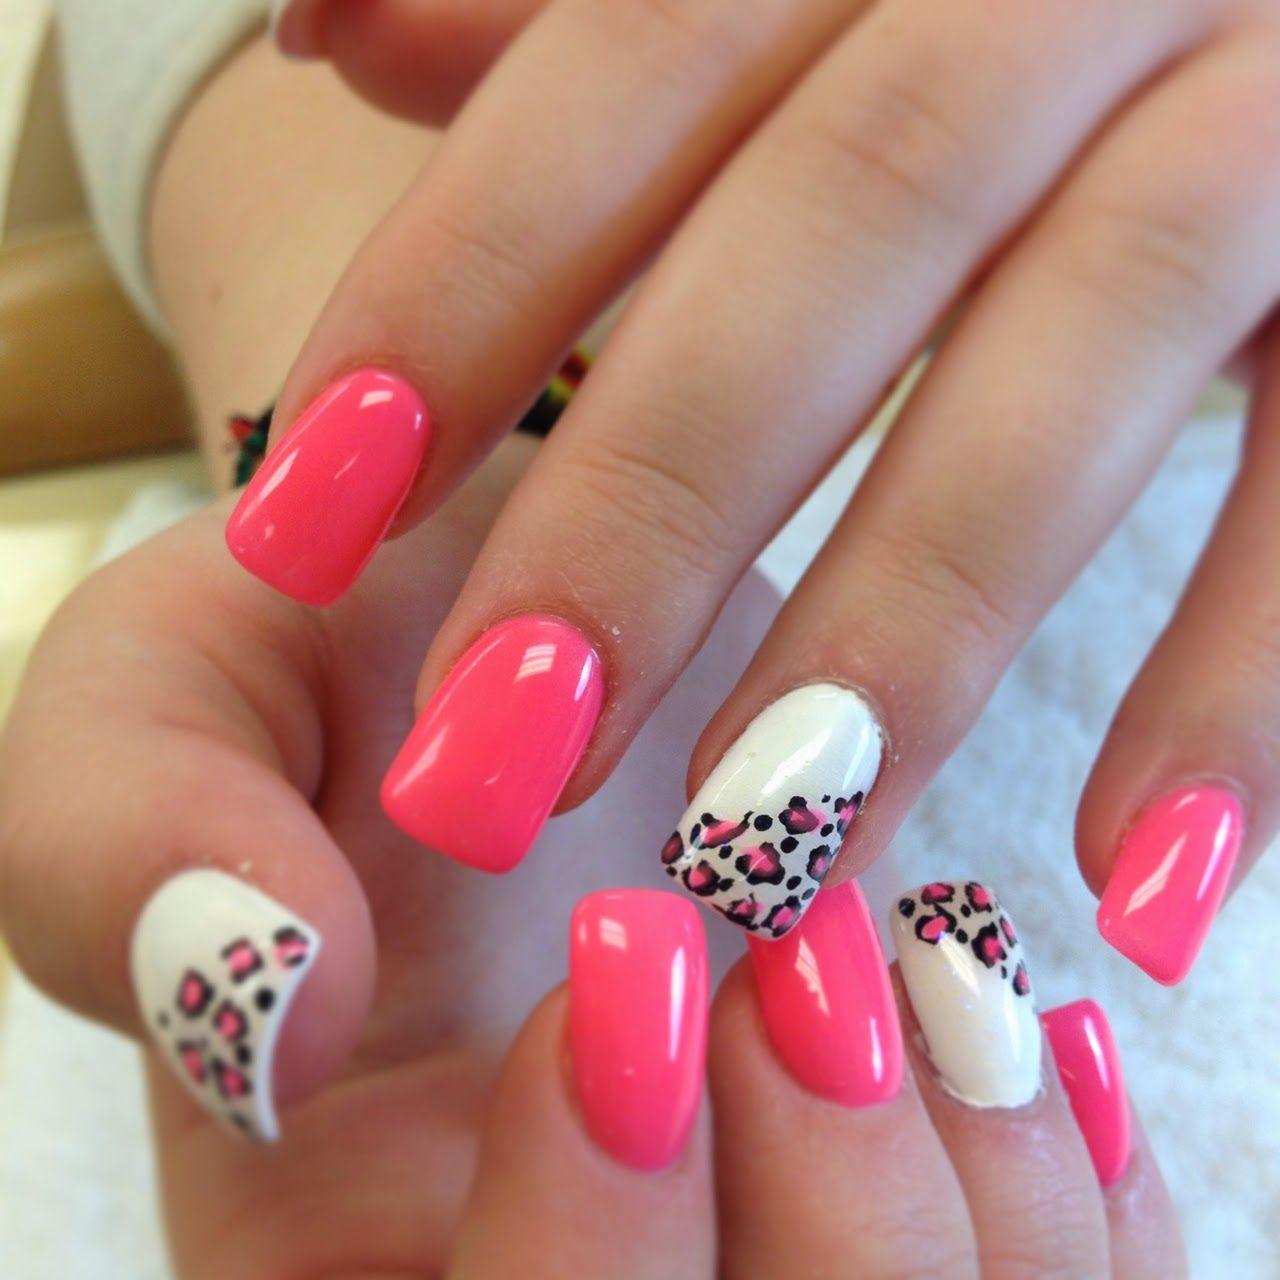 DIY acrylic nails | Life in the Fash Lane | Pinterest | Diy acrylic ...